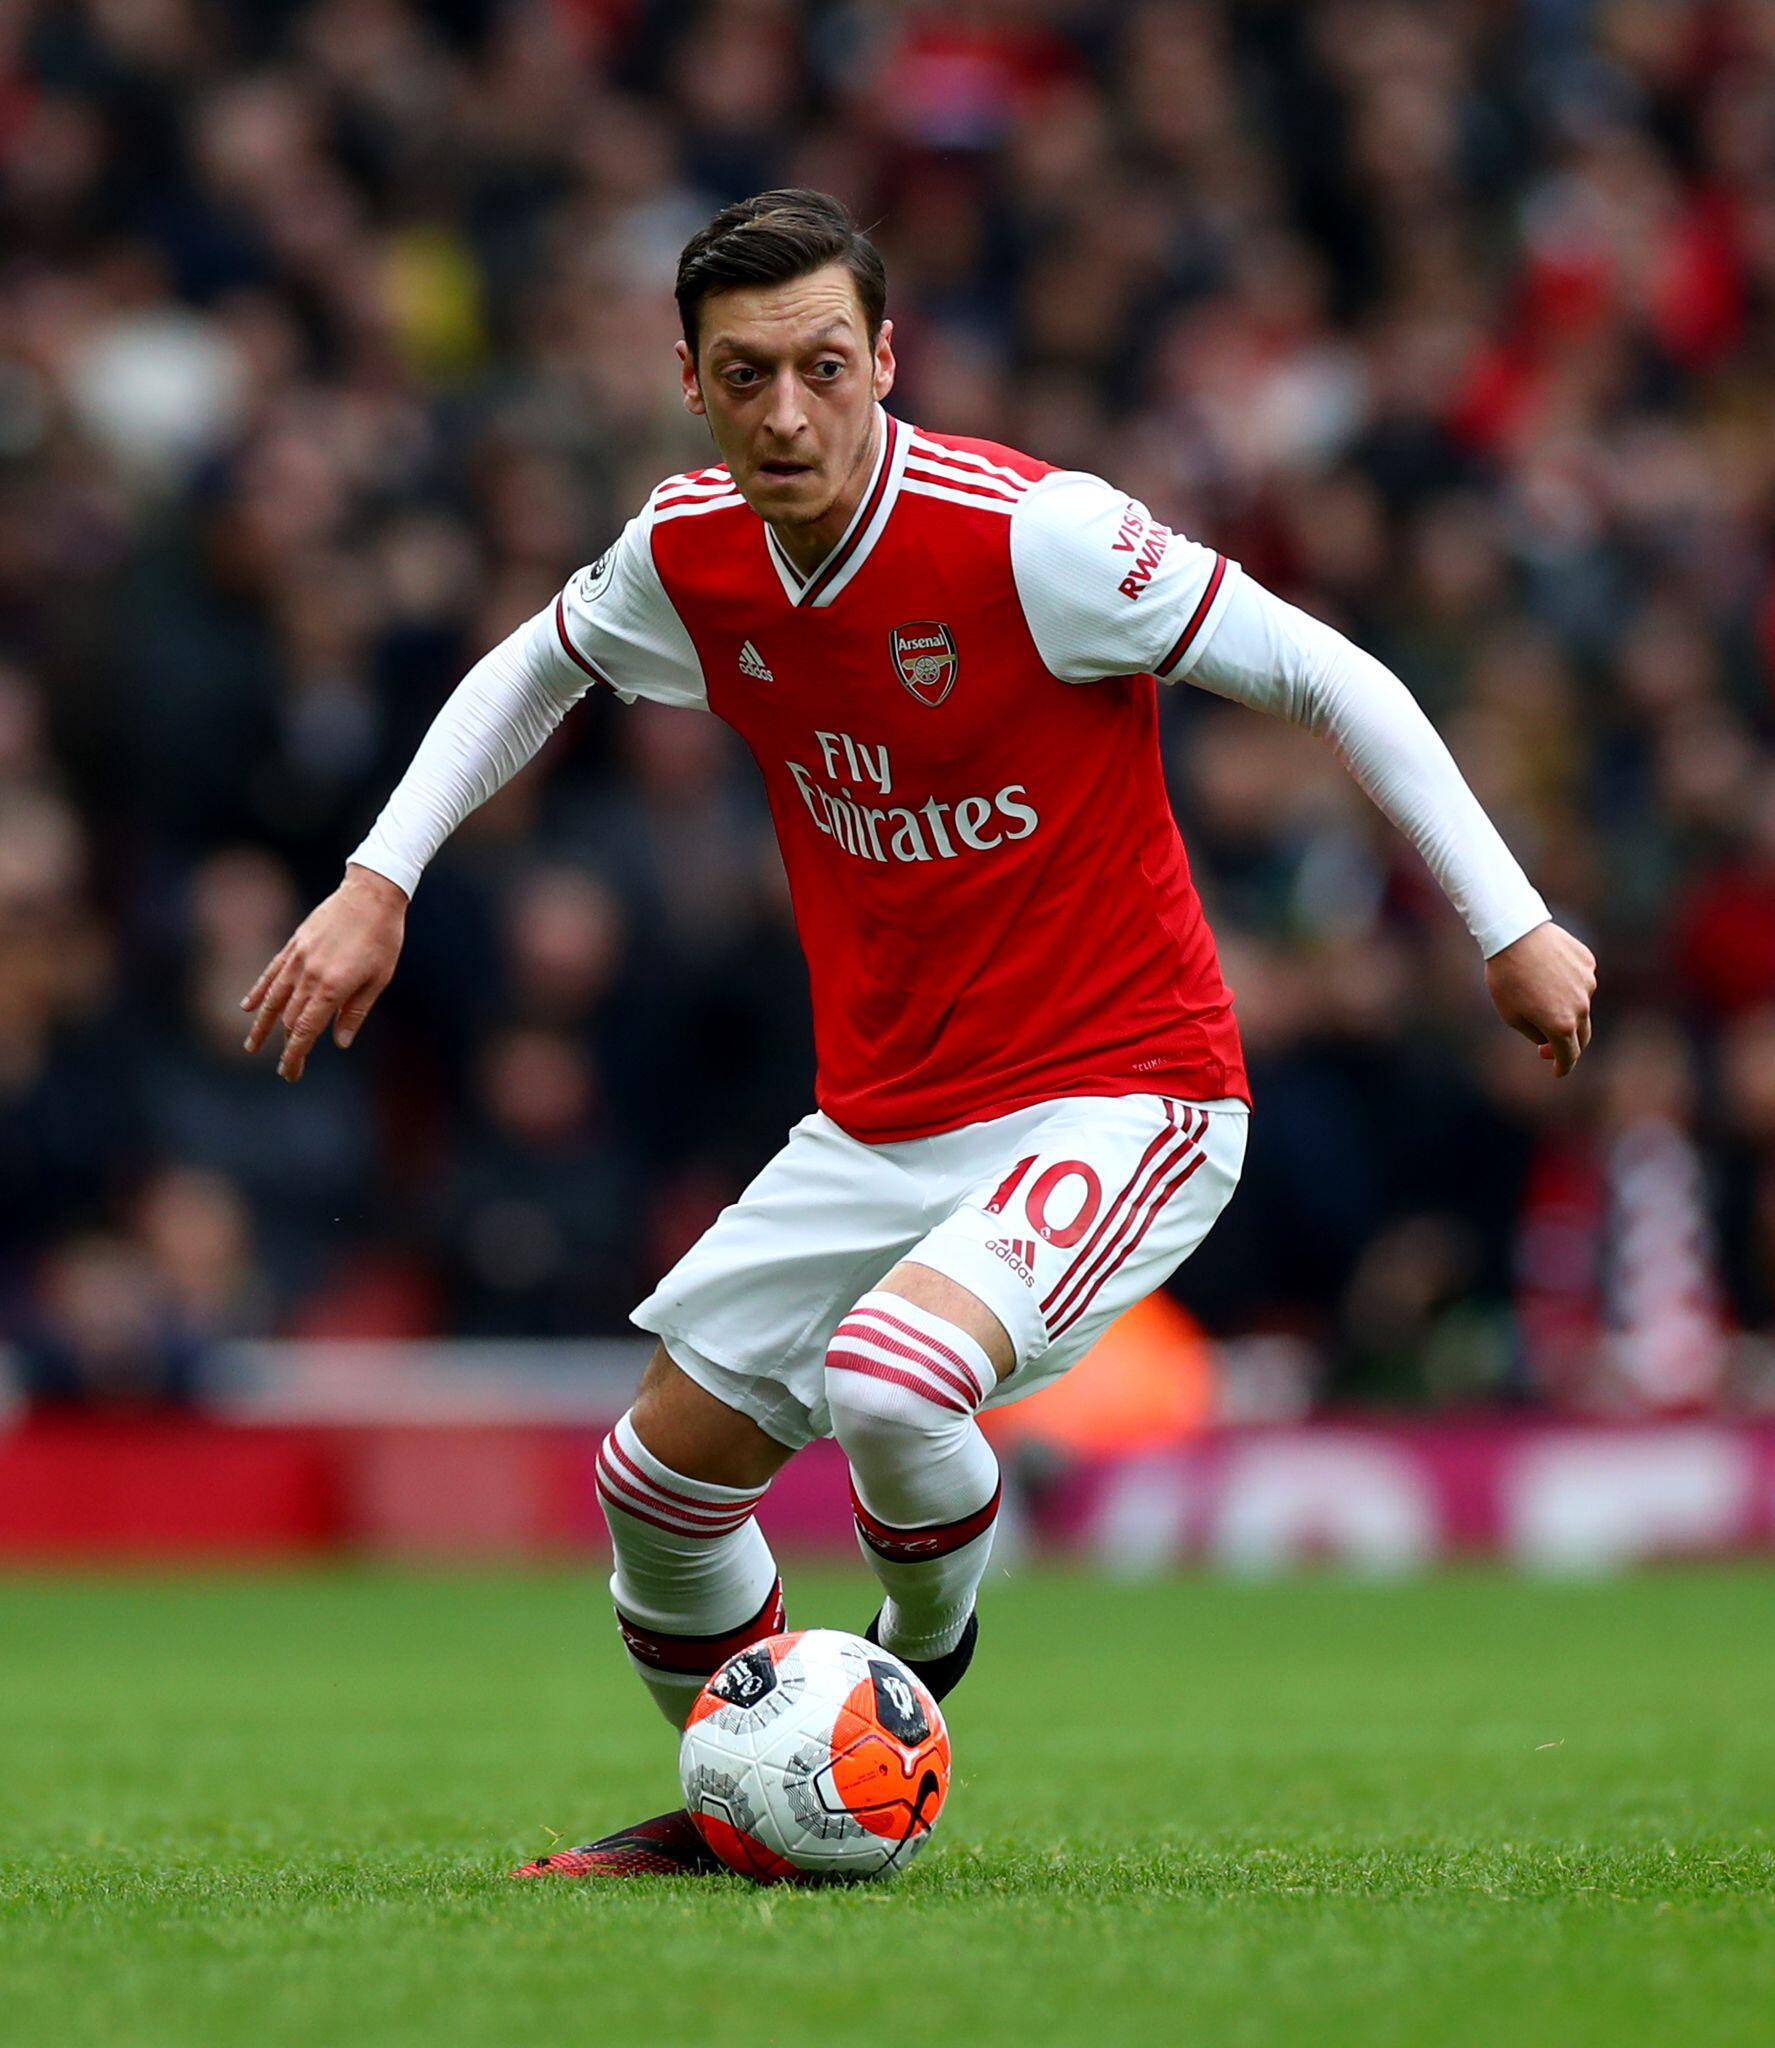 Bild zu Mesut Özil wechselt vom FC Arsenal zu Fenerbahce Istanbul